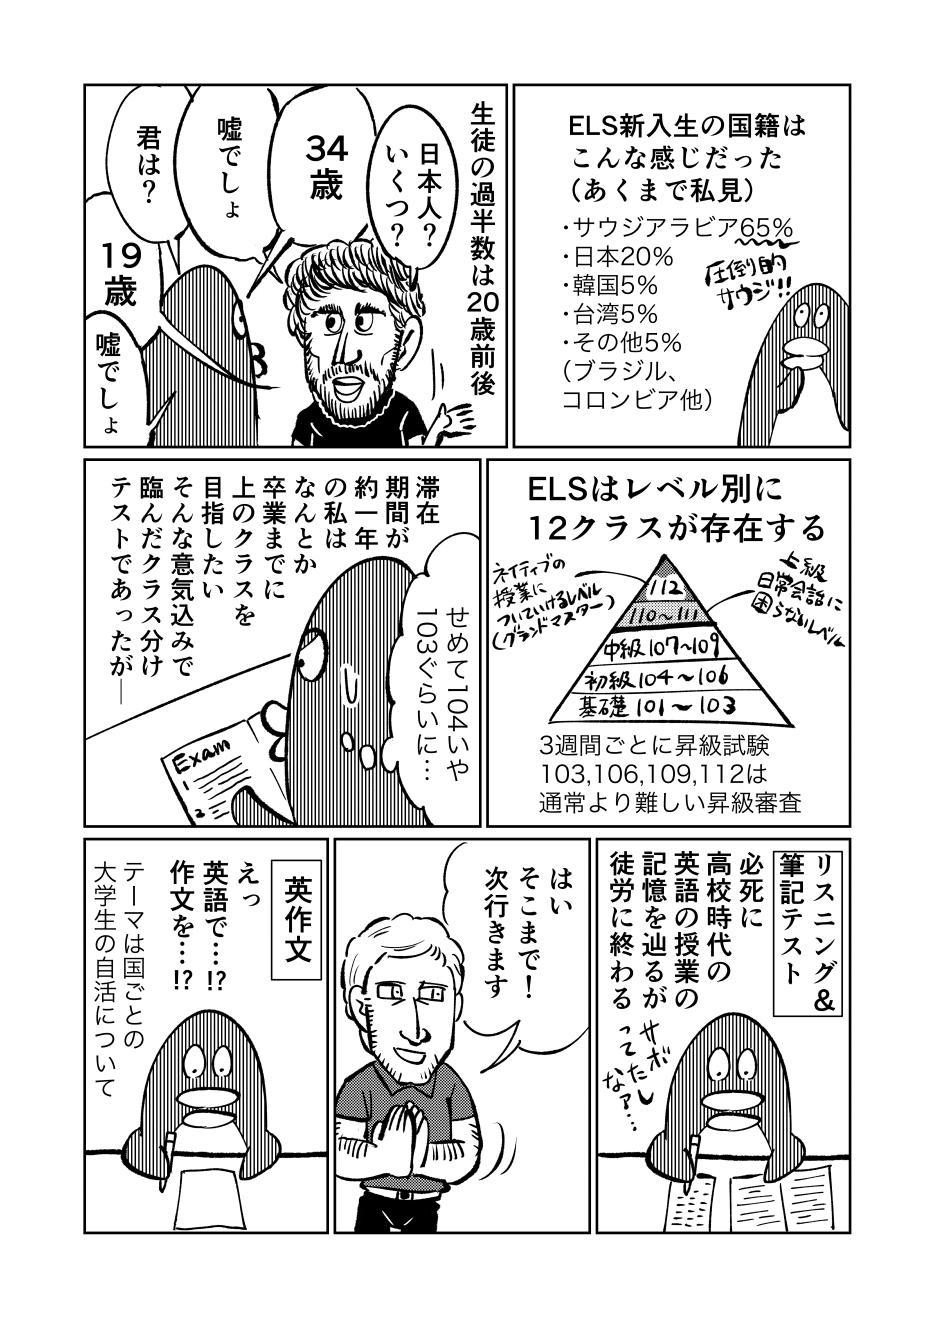 https://www.ryugaku.co.jp/blog/els_portland/upload/ryugaku52.jpg